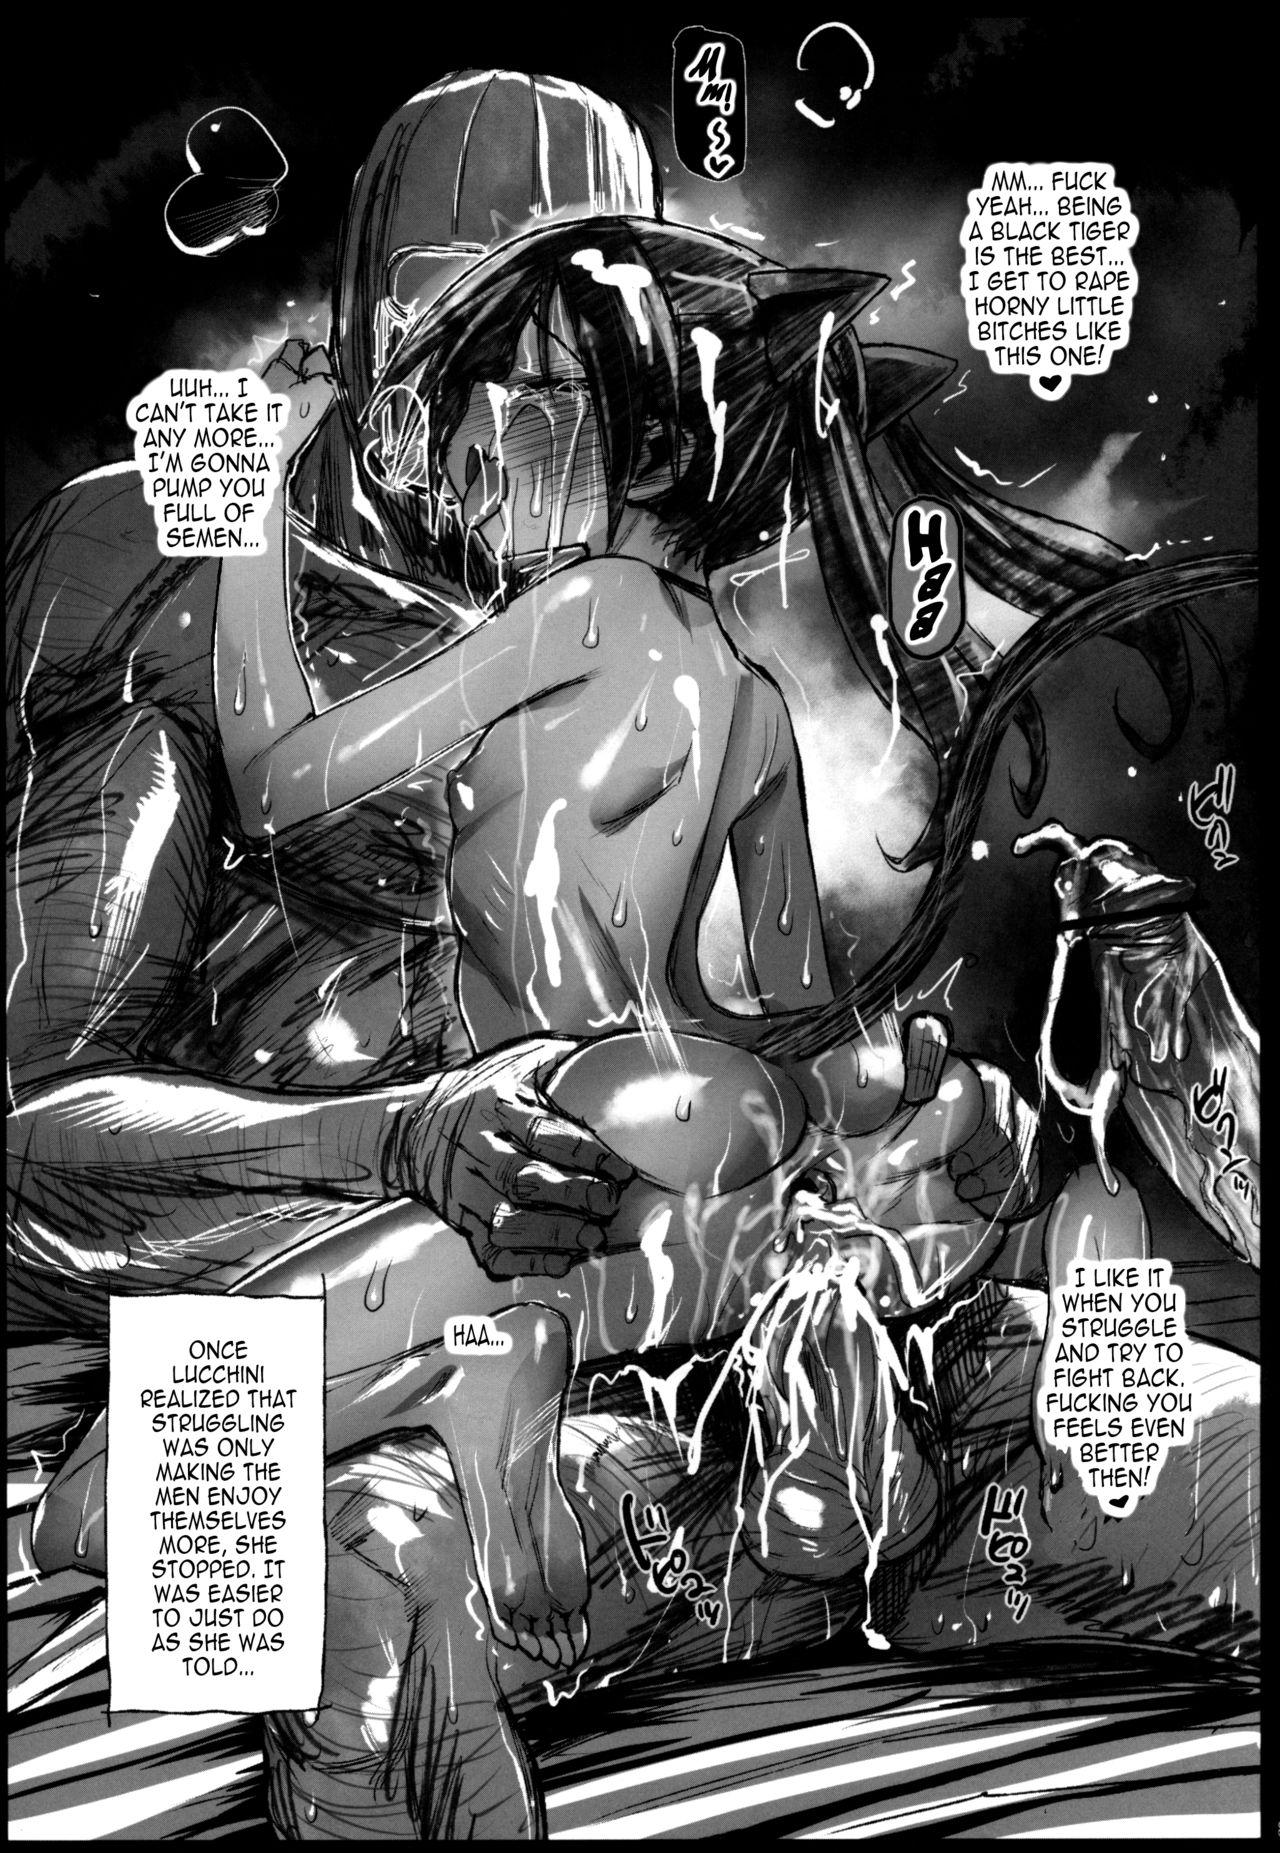 [Eromazun (Ma-Kurou)] Saint Helena Gakuen 2 ~ Terrorist ni Senkyosareta Jogakuen de Rape Matsuri!~   Saint Helena Academy 2 ~A School Occupied by Terrorists Becomes a Rape Festival!~ (Various) [English] [B.E.C. Scans] 35